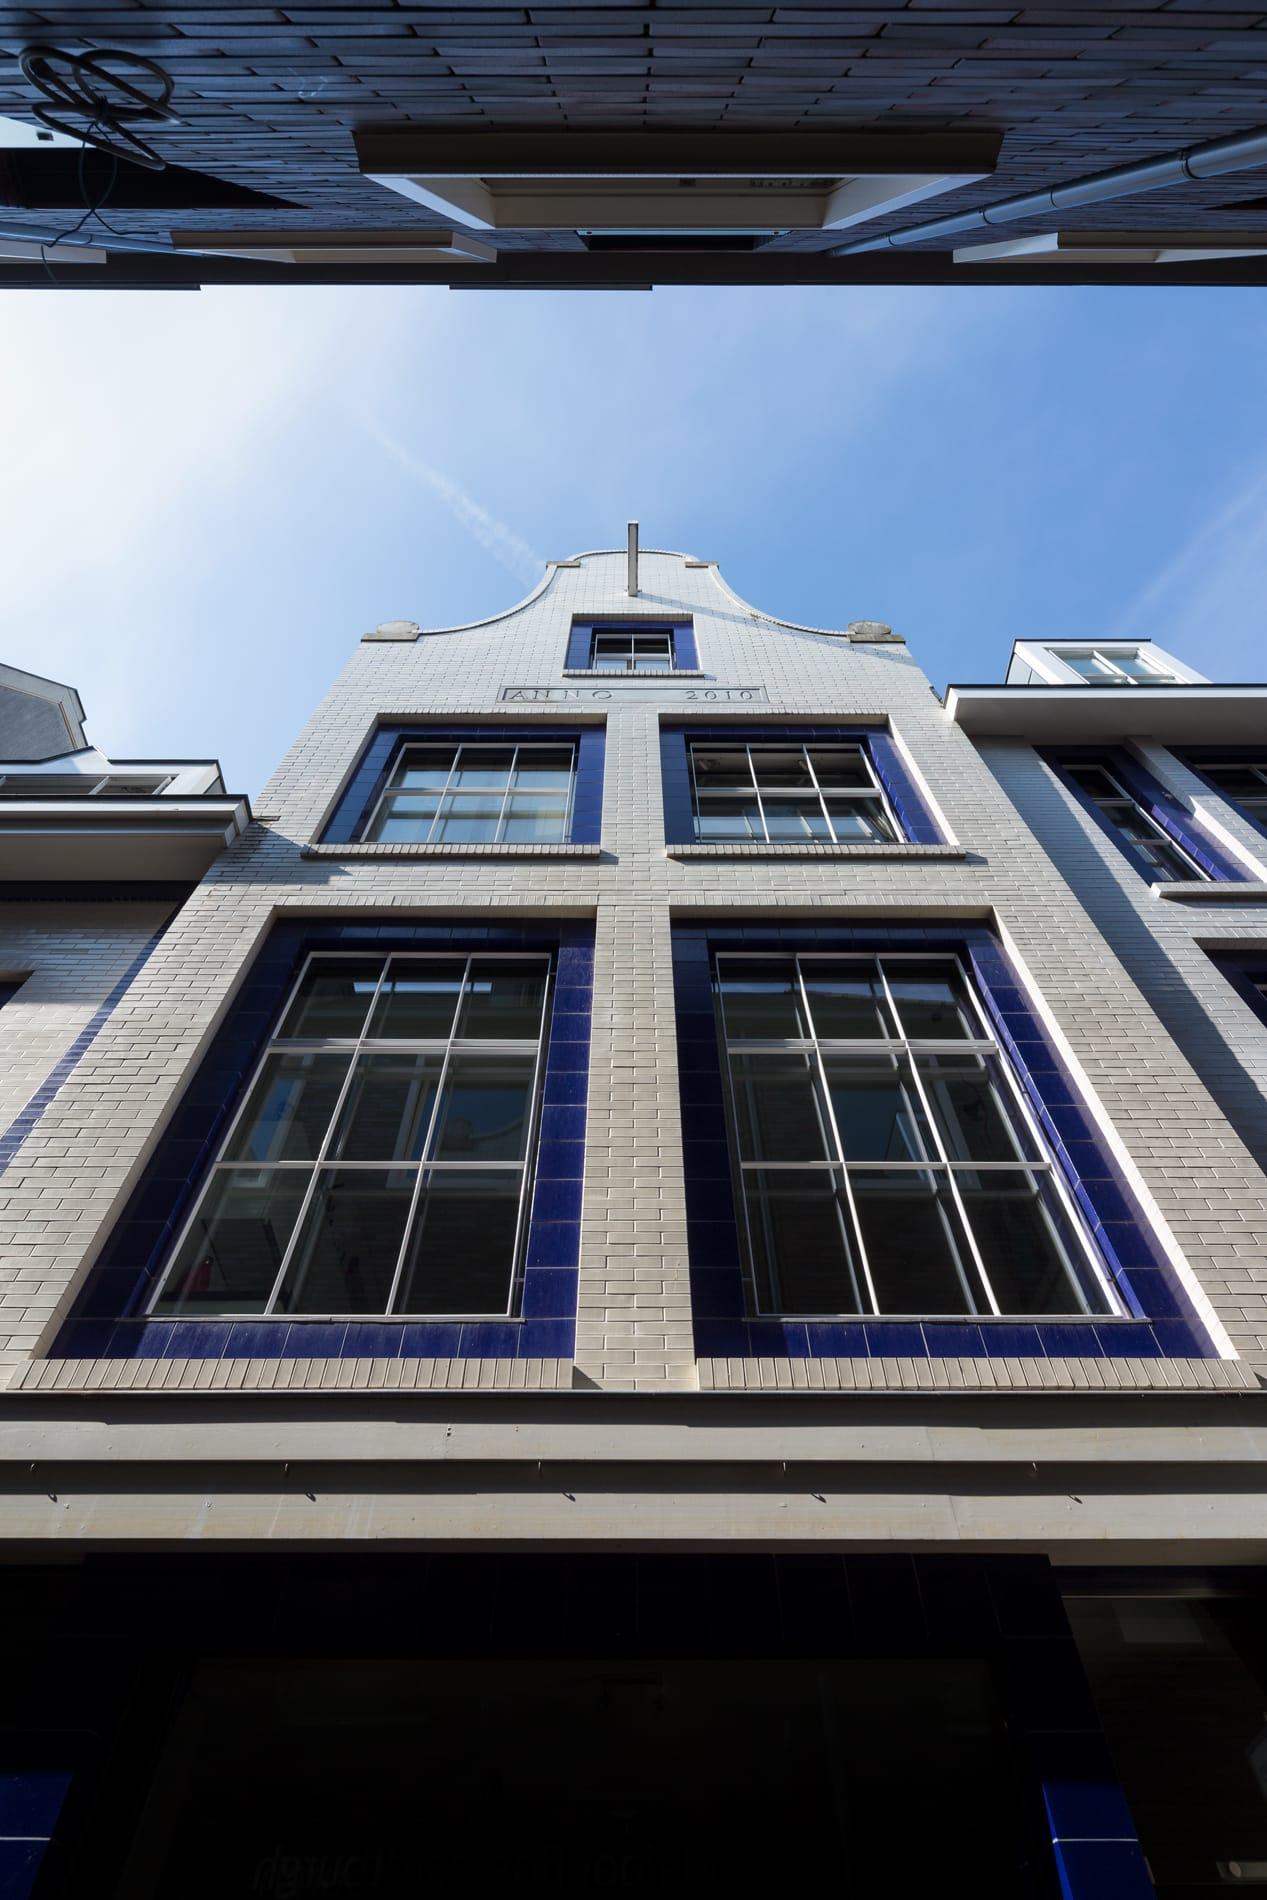 Amsterdam Herstelt / Recreating Amsterdam